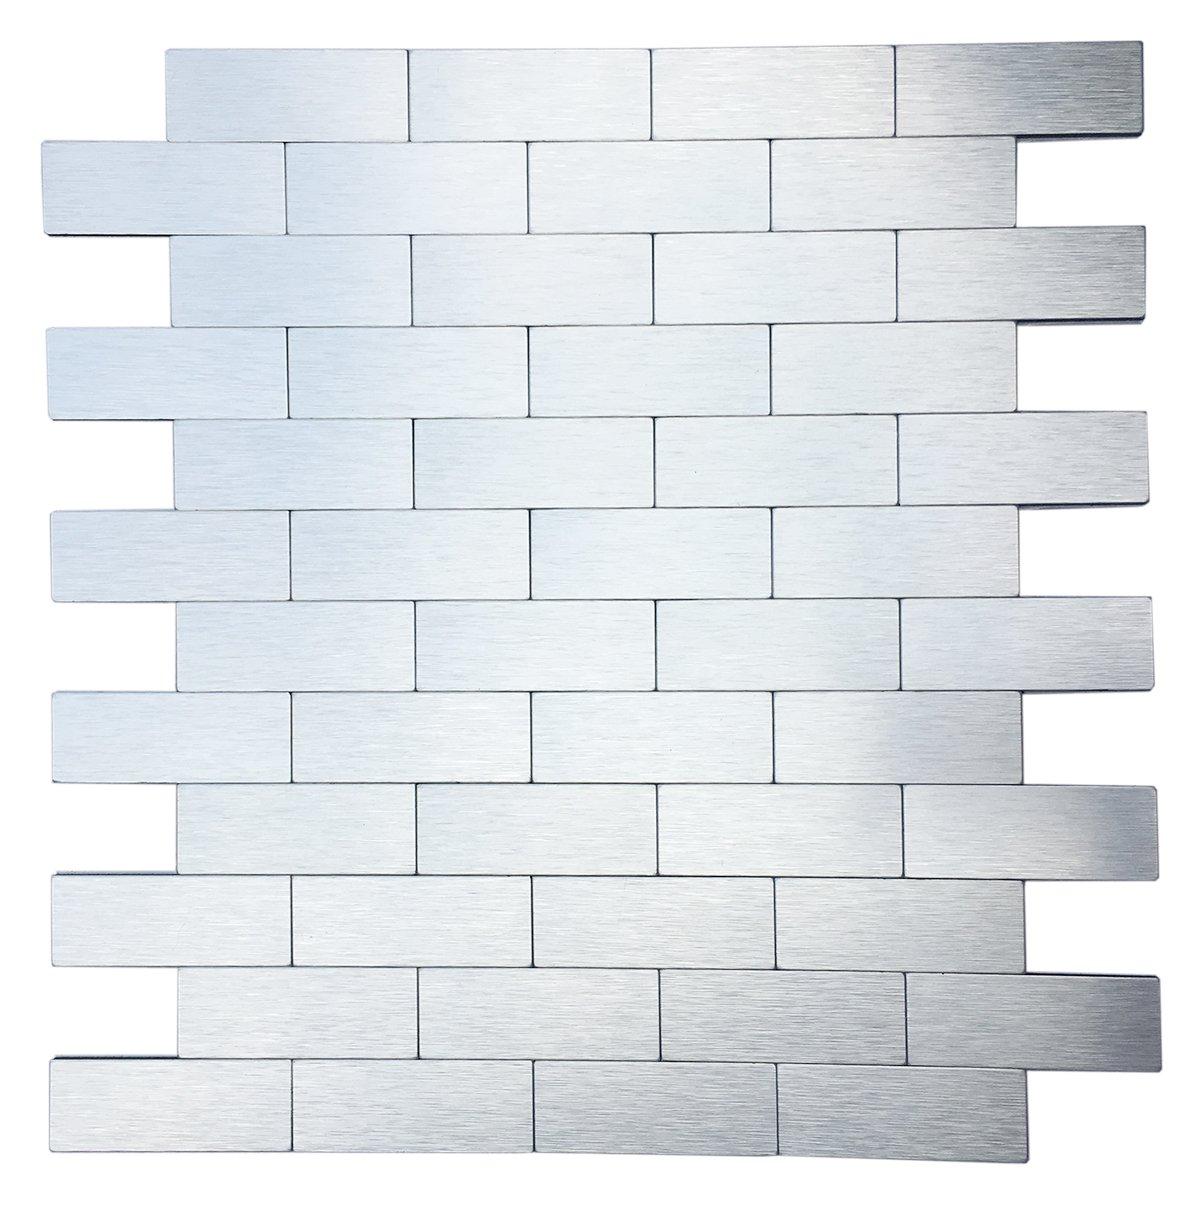 Art3d Peel And Stick Metal Backsplash Tile For Kitchen / Bathroom, Brush  Silver Alumimium     Amazon.com